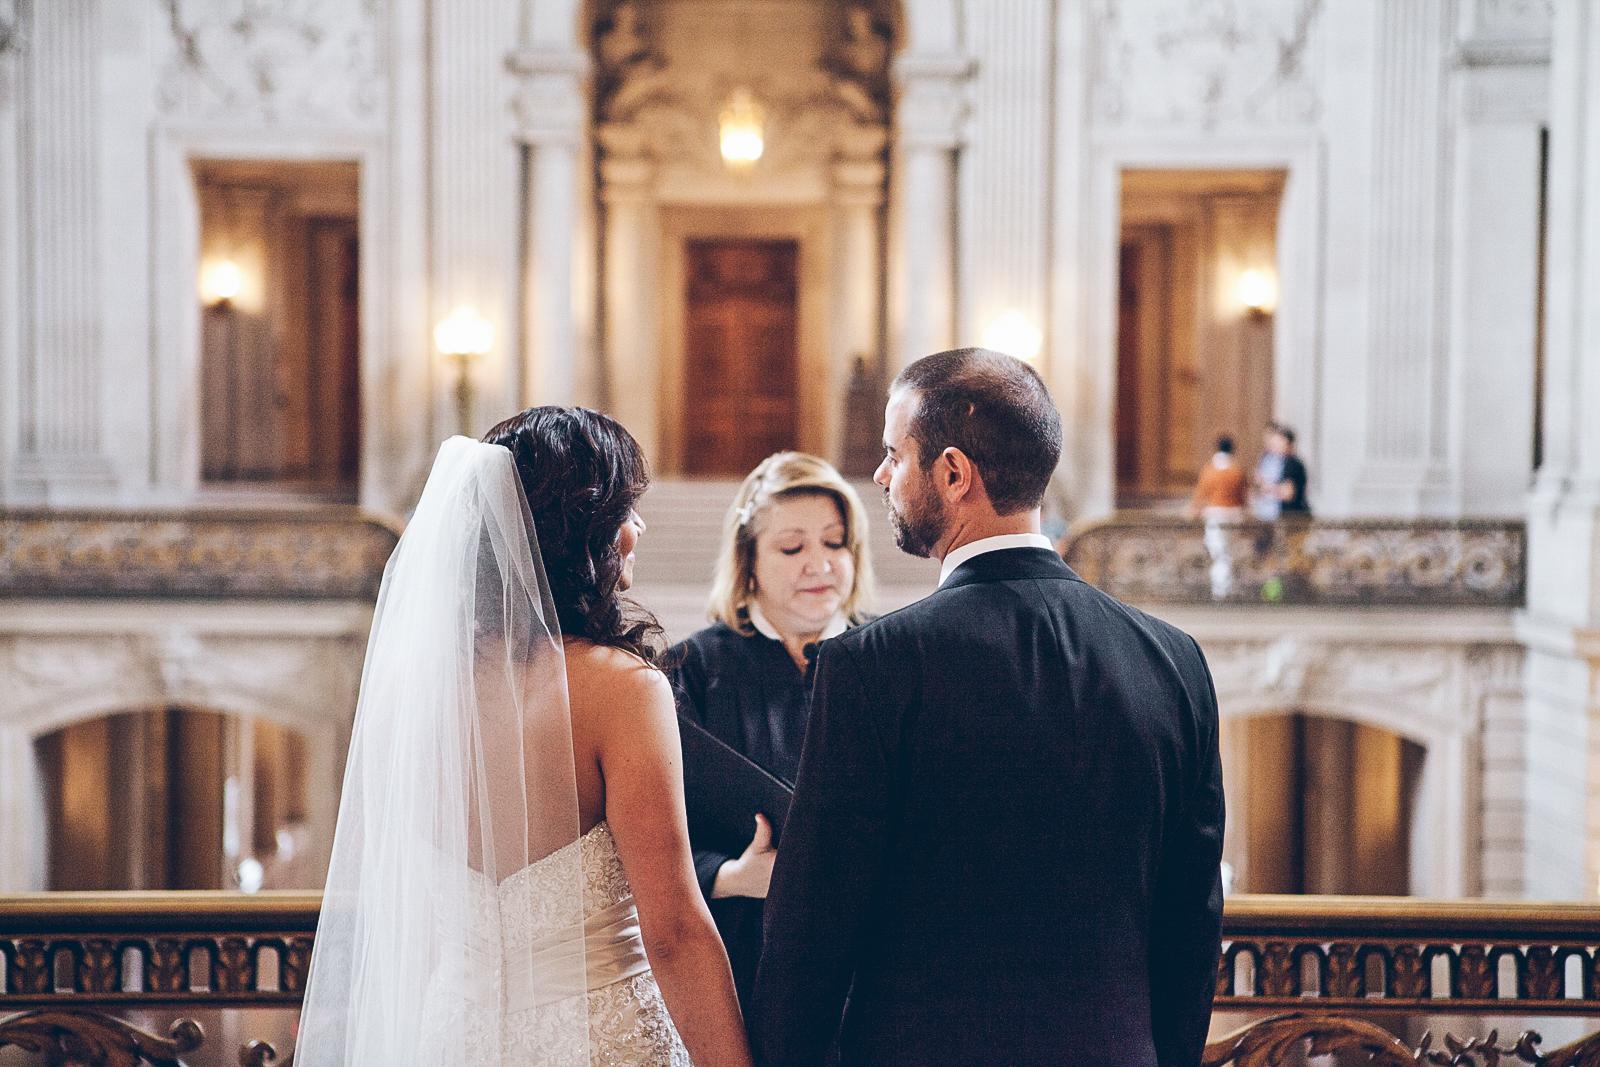 San_francisco_city_hall_wedding_photography_meegan_travis_ebony_siovhan_bokeh_photography_18.jpg